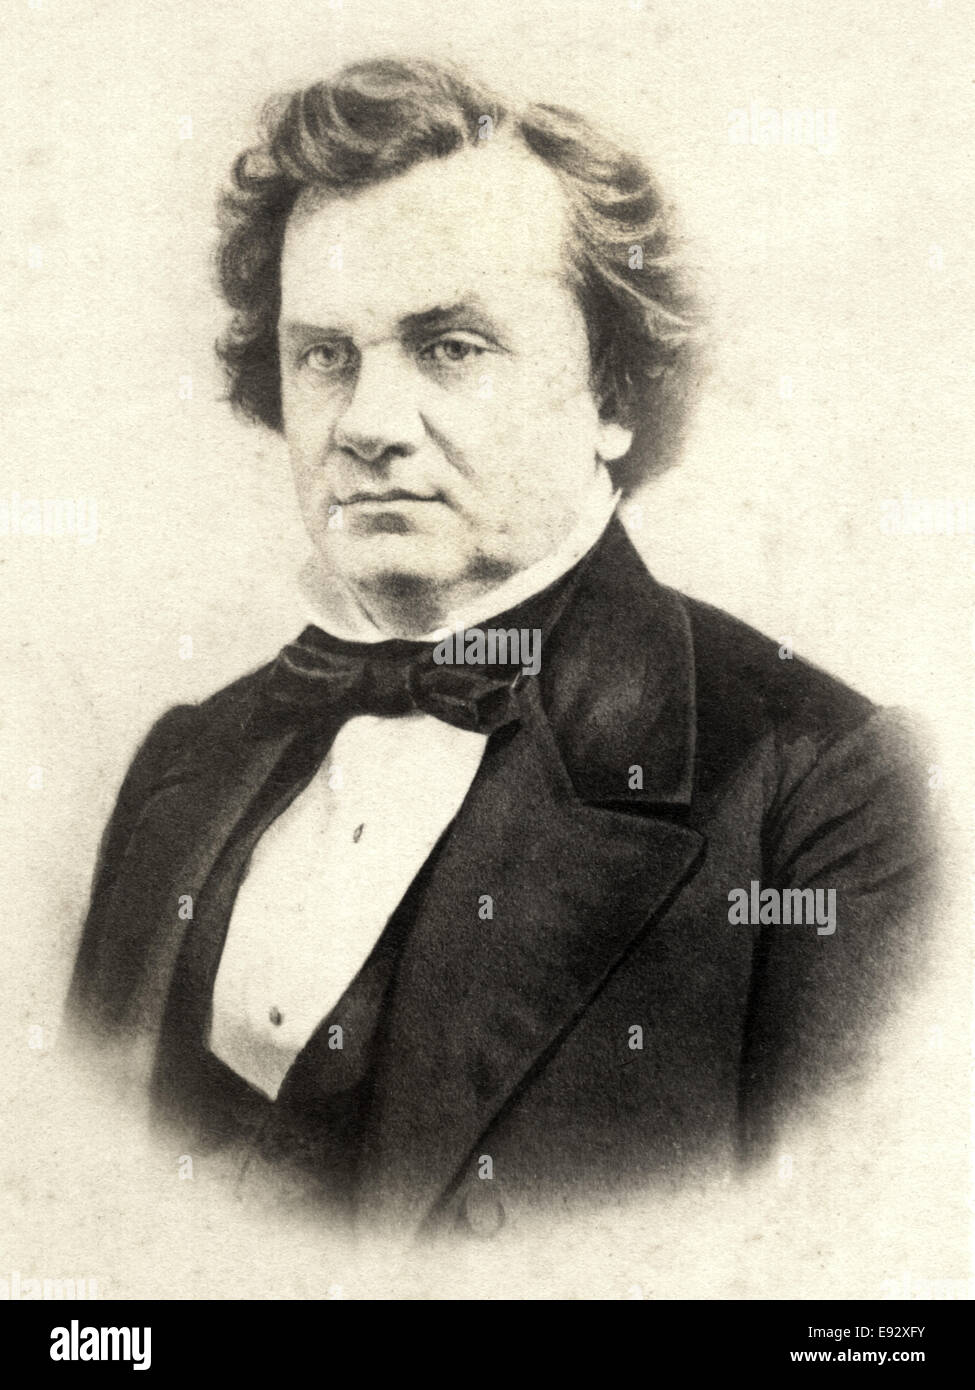 Stephen A. Douglas (1813-1861), American Politician from Illinois, USA, Portrait, 1860 - Stock Image